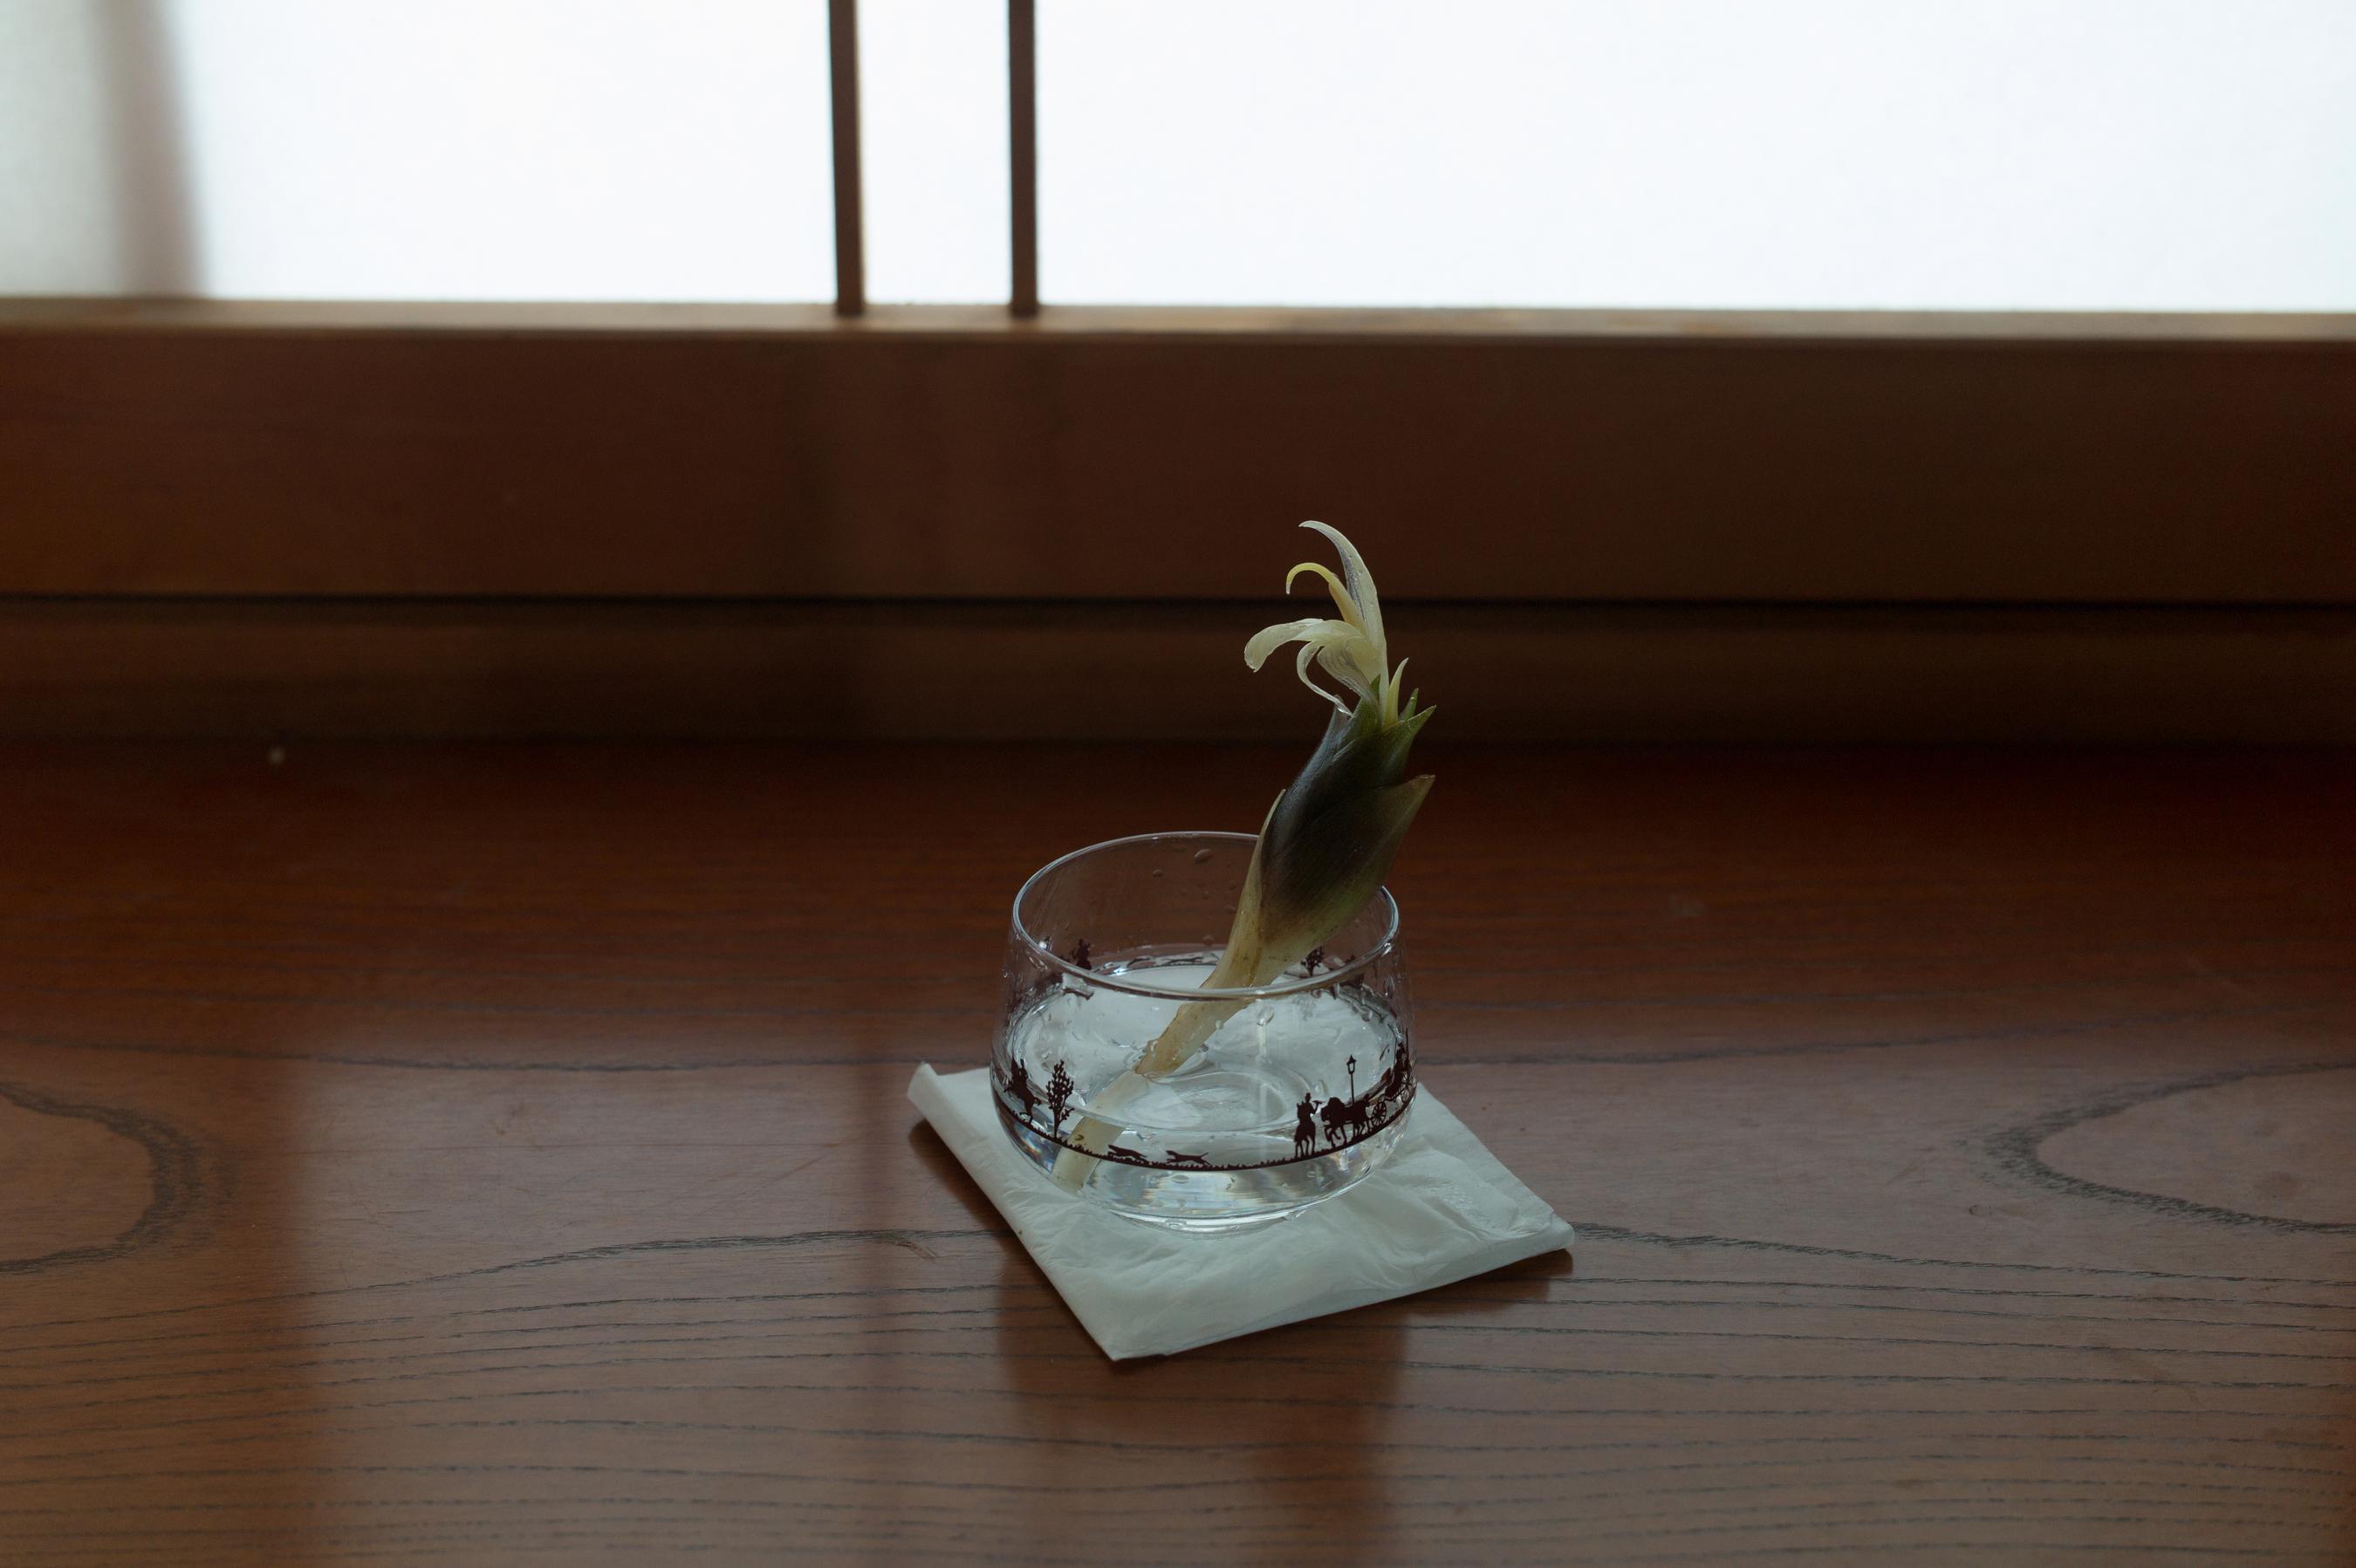 f:id:aoyama-takuro:20190814213313j:plain